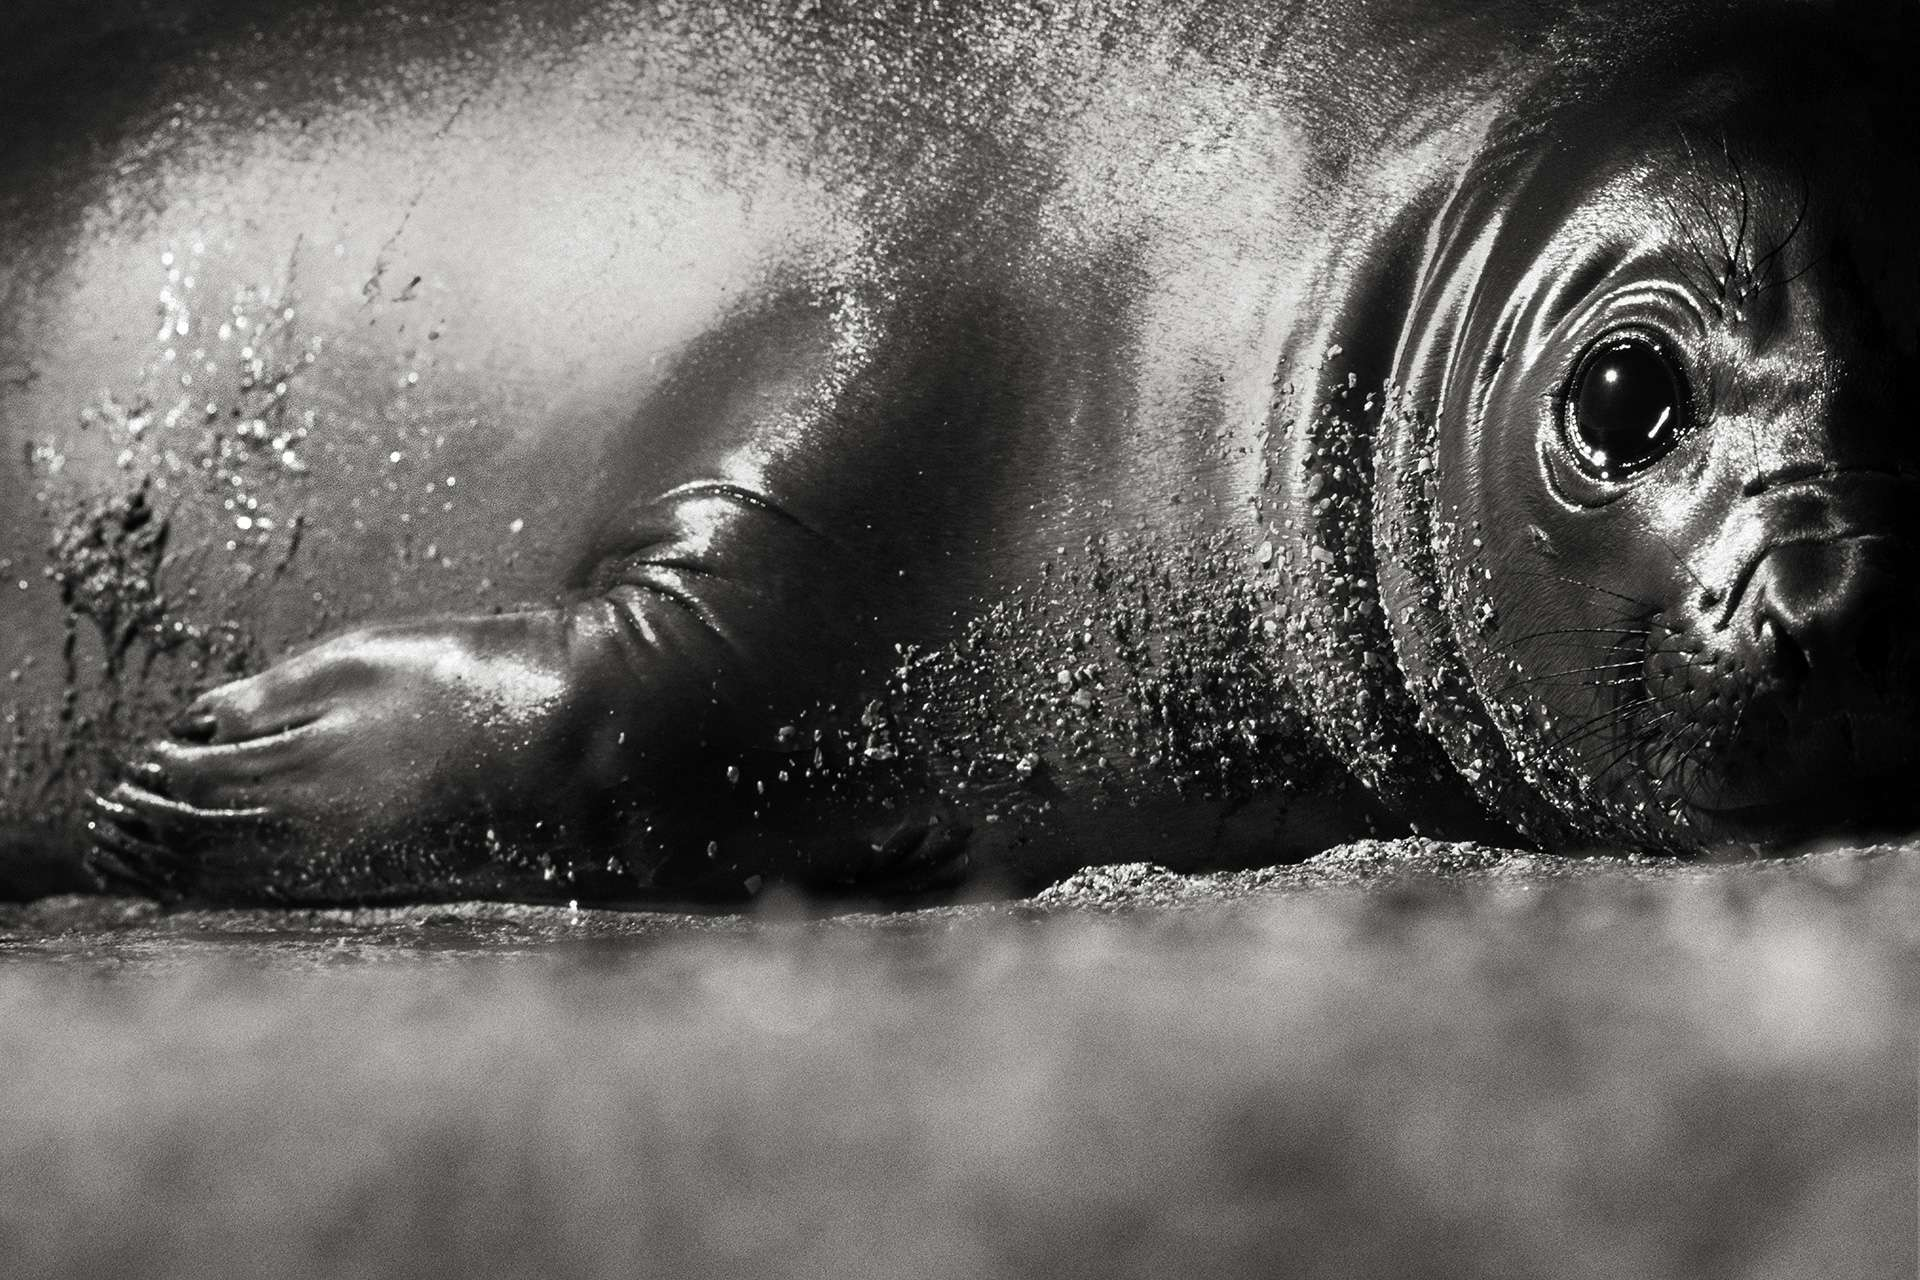 Gilles Martin's photograph : elephant seal (mirounga) from Argentina, Struggle for life